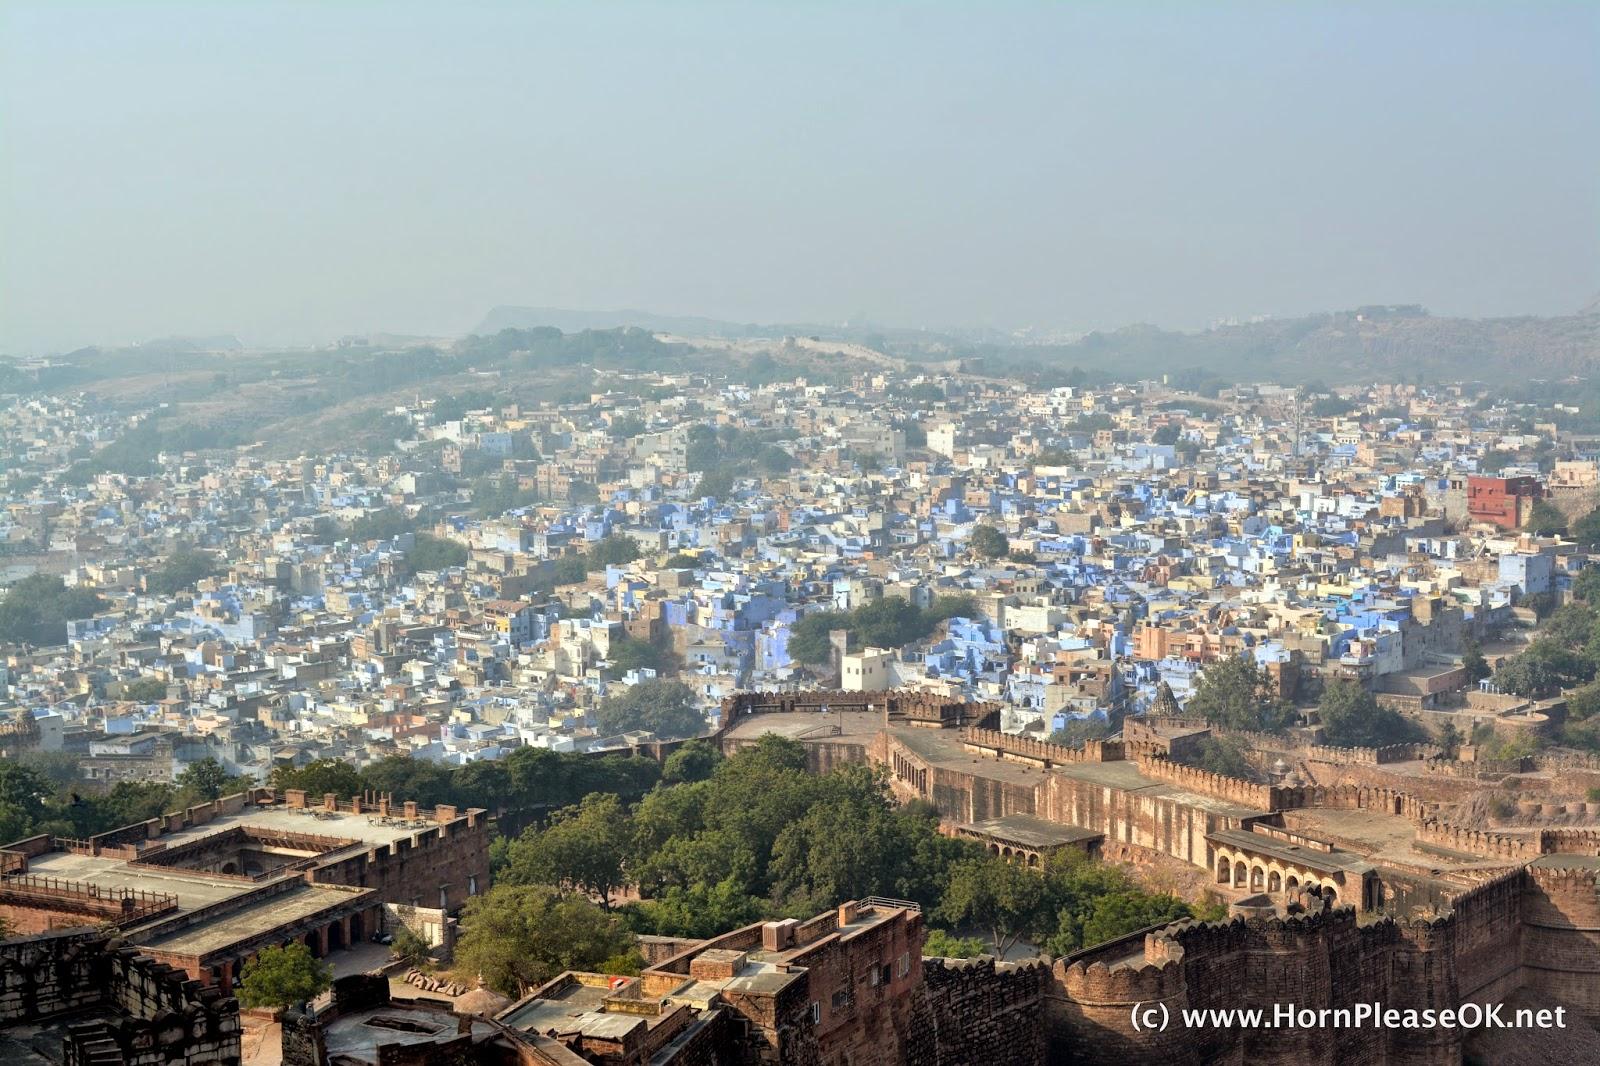 A view of Jodhpur, The Blue City